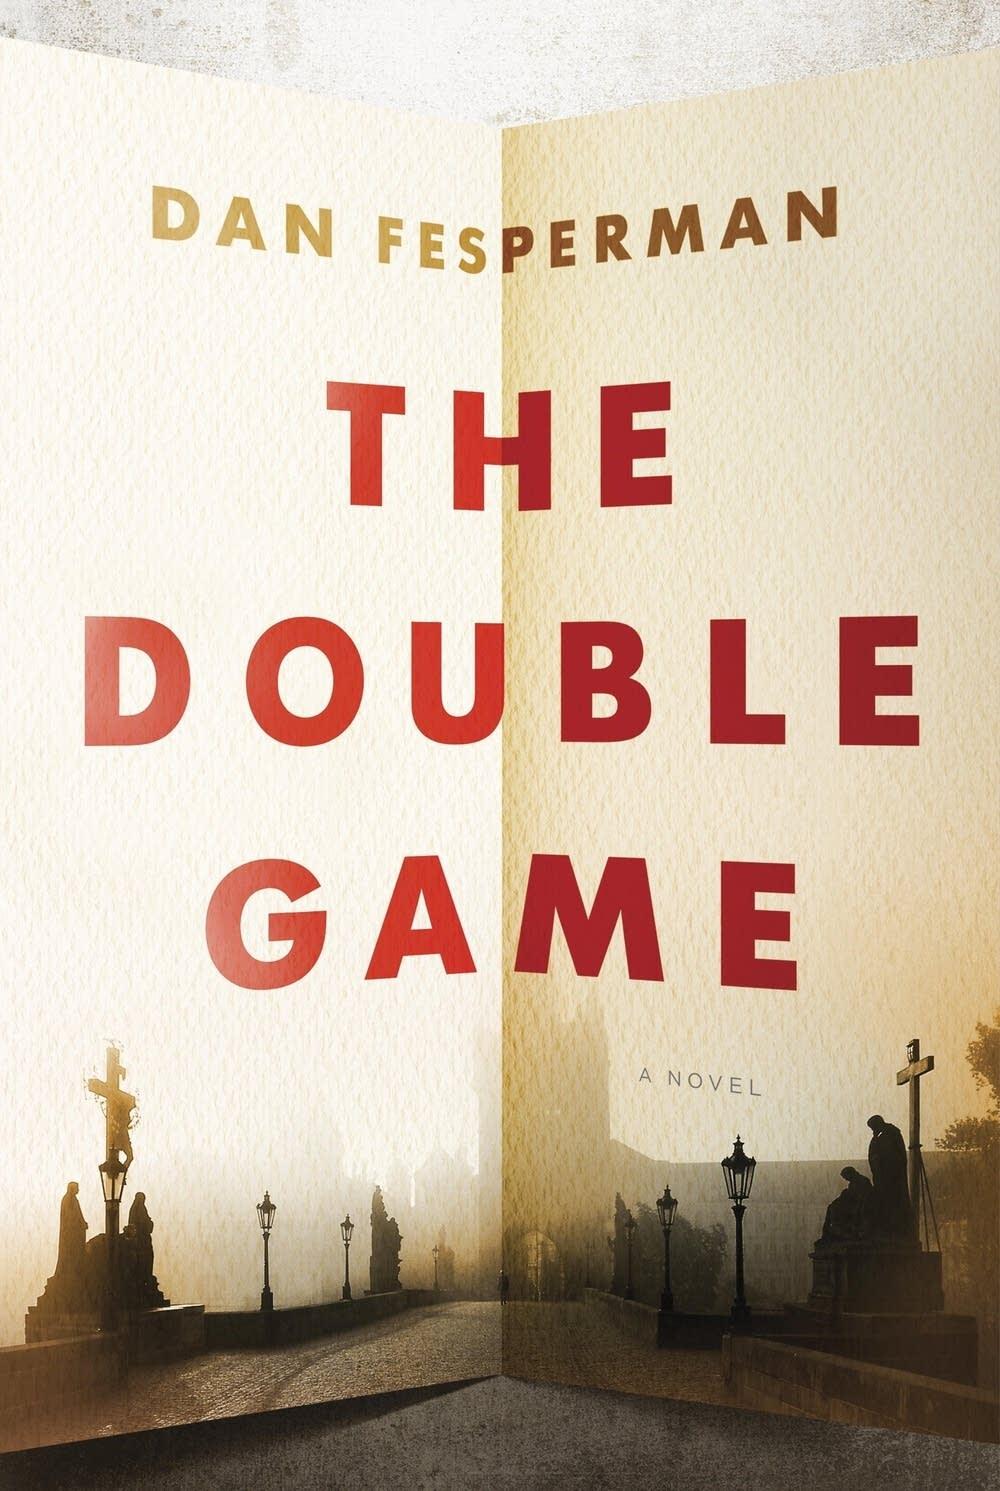 'The Double Game' by Dan Fesperman